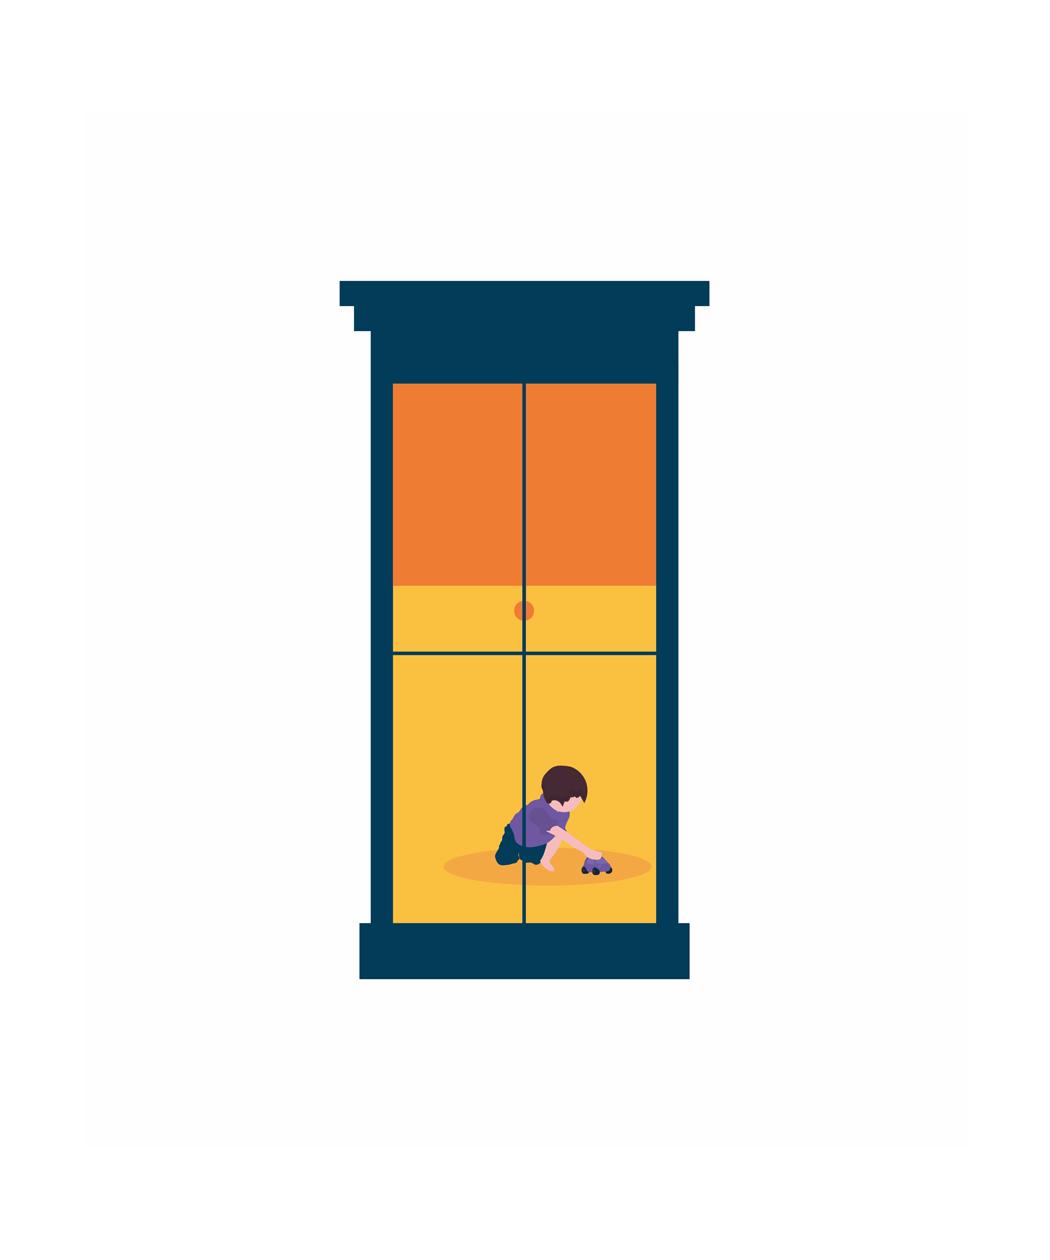 mental health podcast artwork window